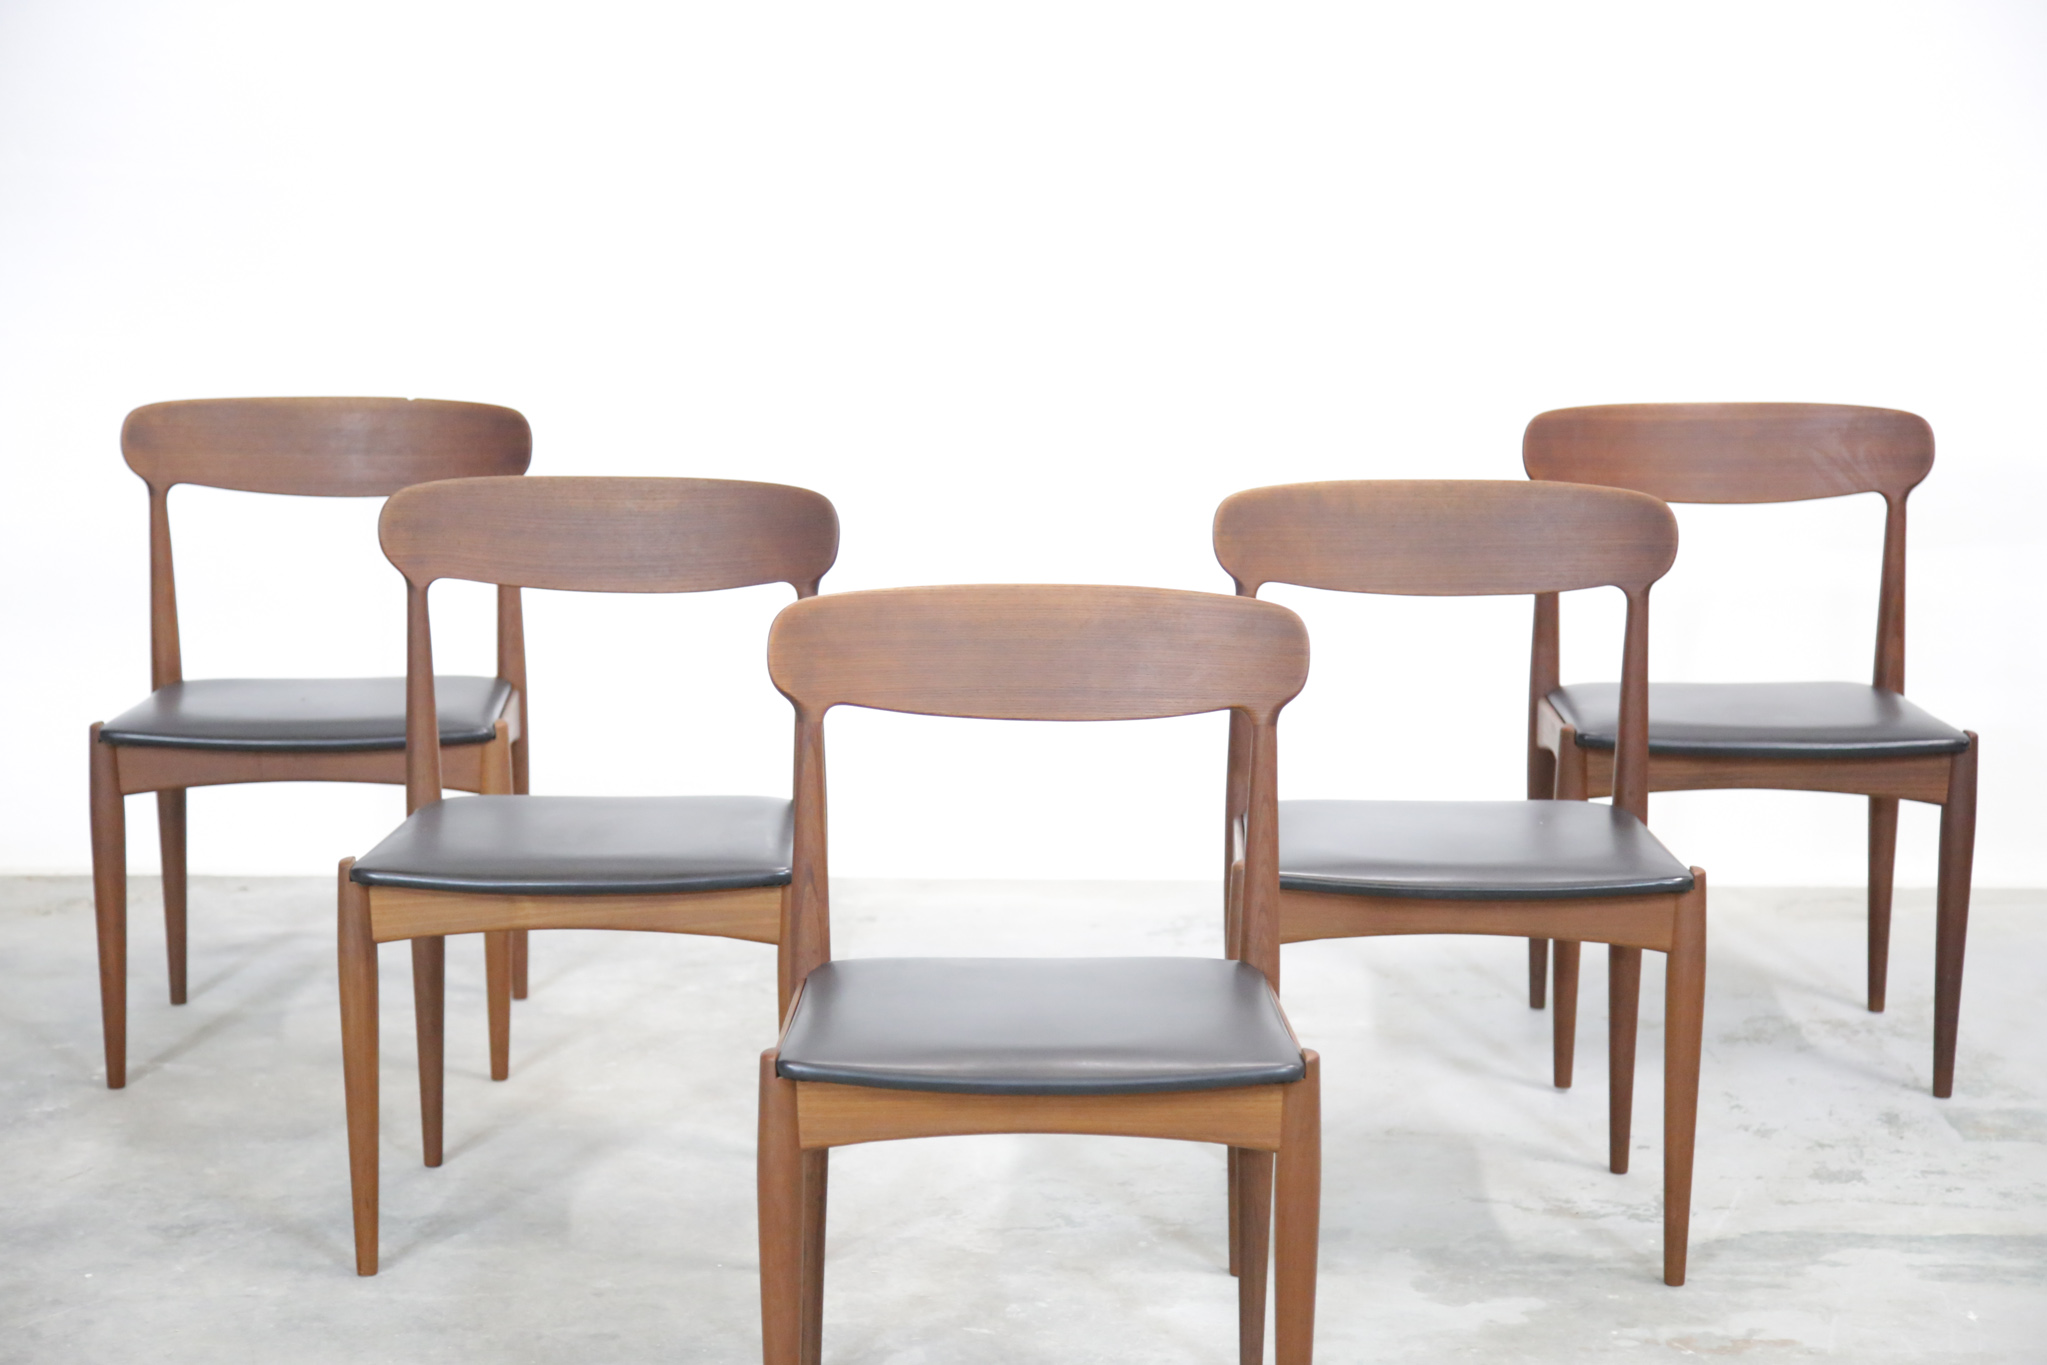 5 Andersen Dining Danke Suite Chaises Johannes Chair – De Danoise sQdCtxhr